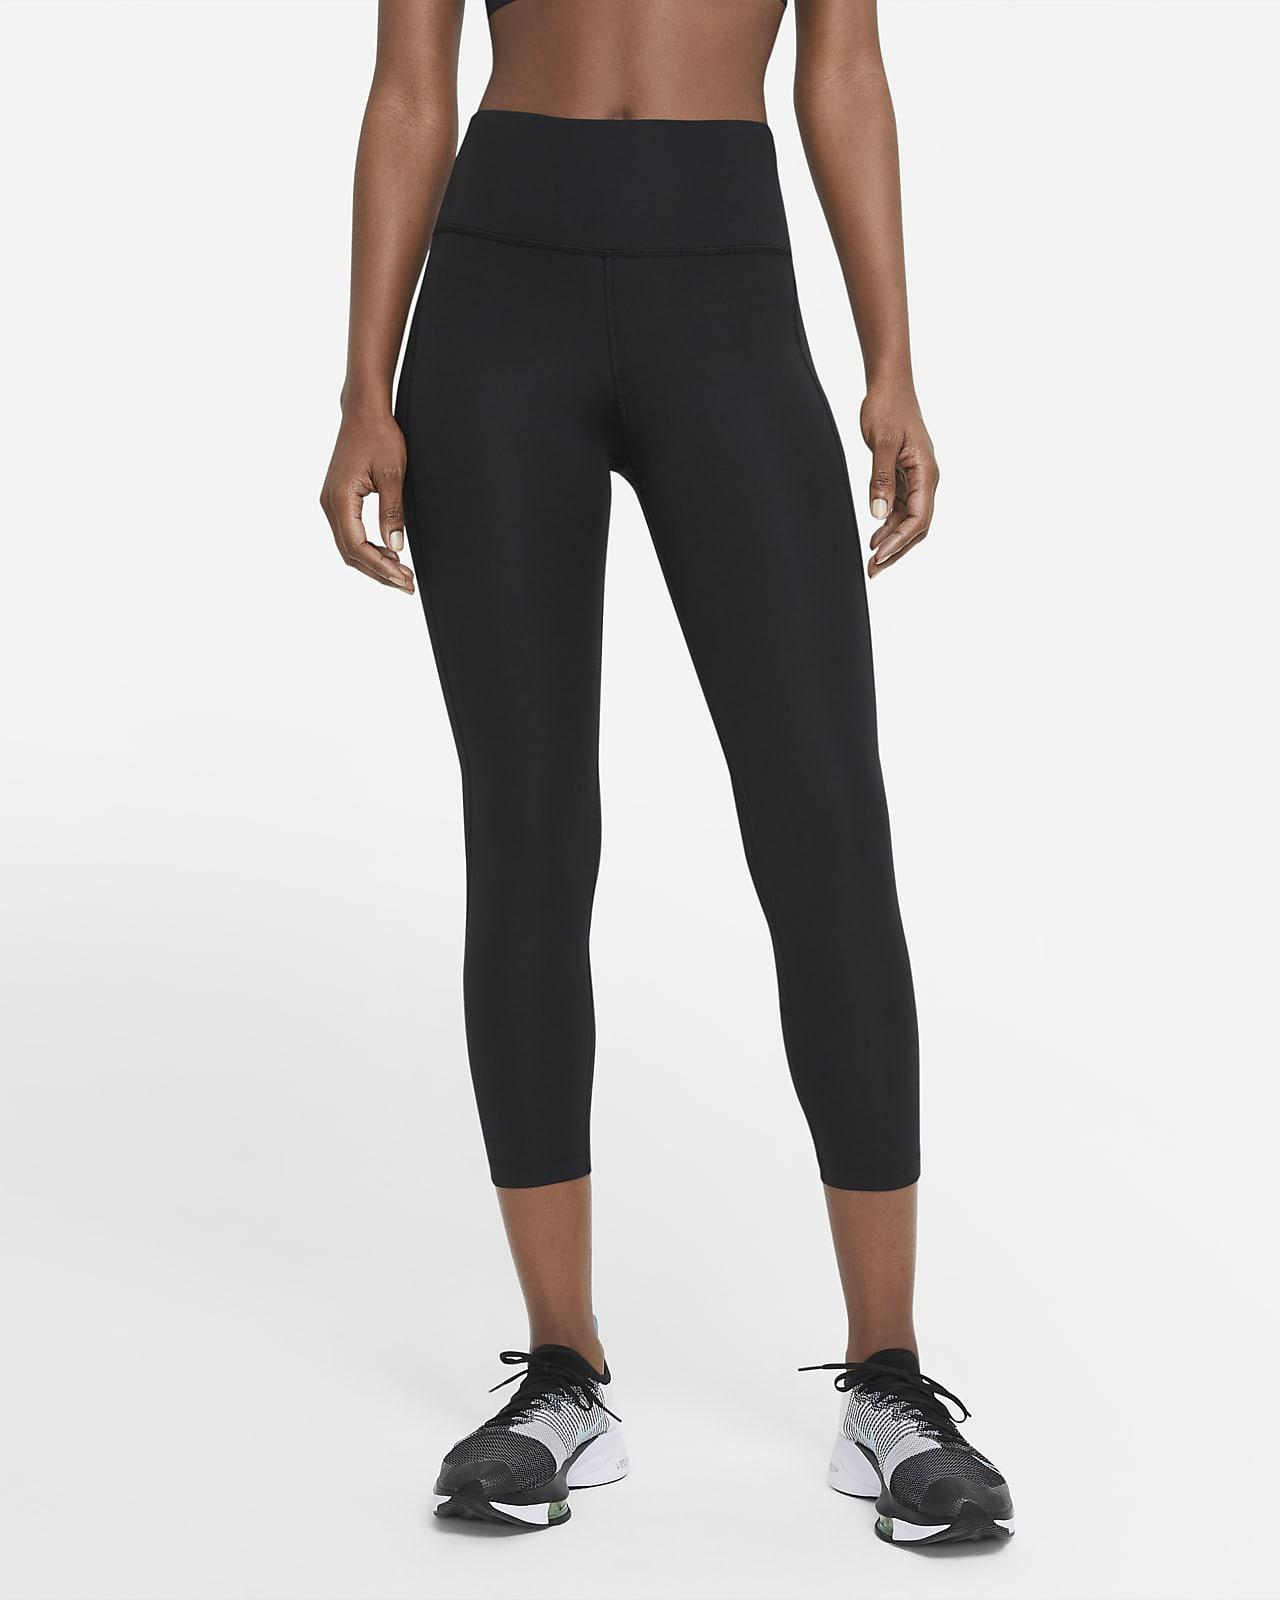 Nike Epic Fast Women's Mid-Rise Crop Running Leggings